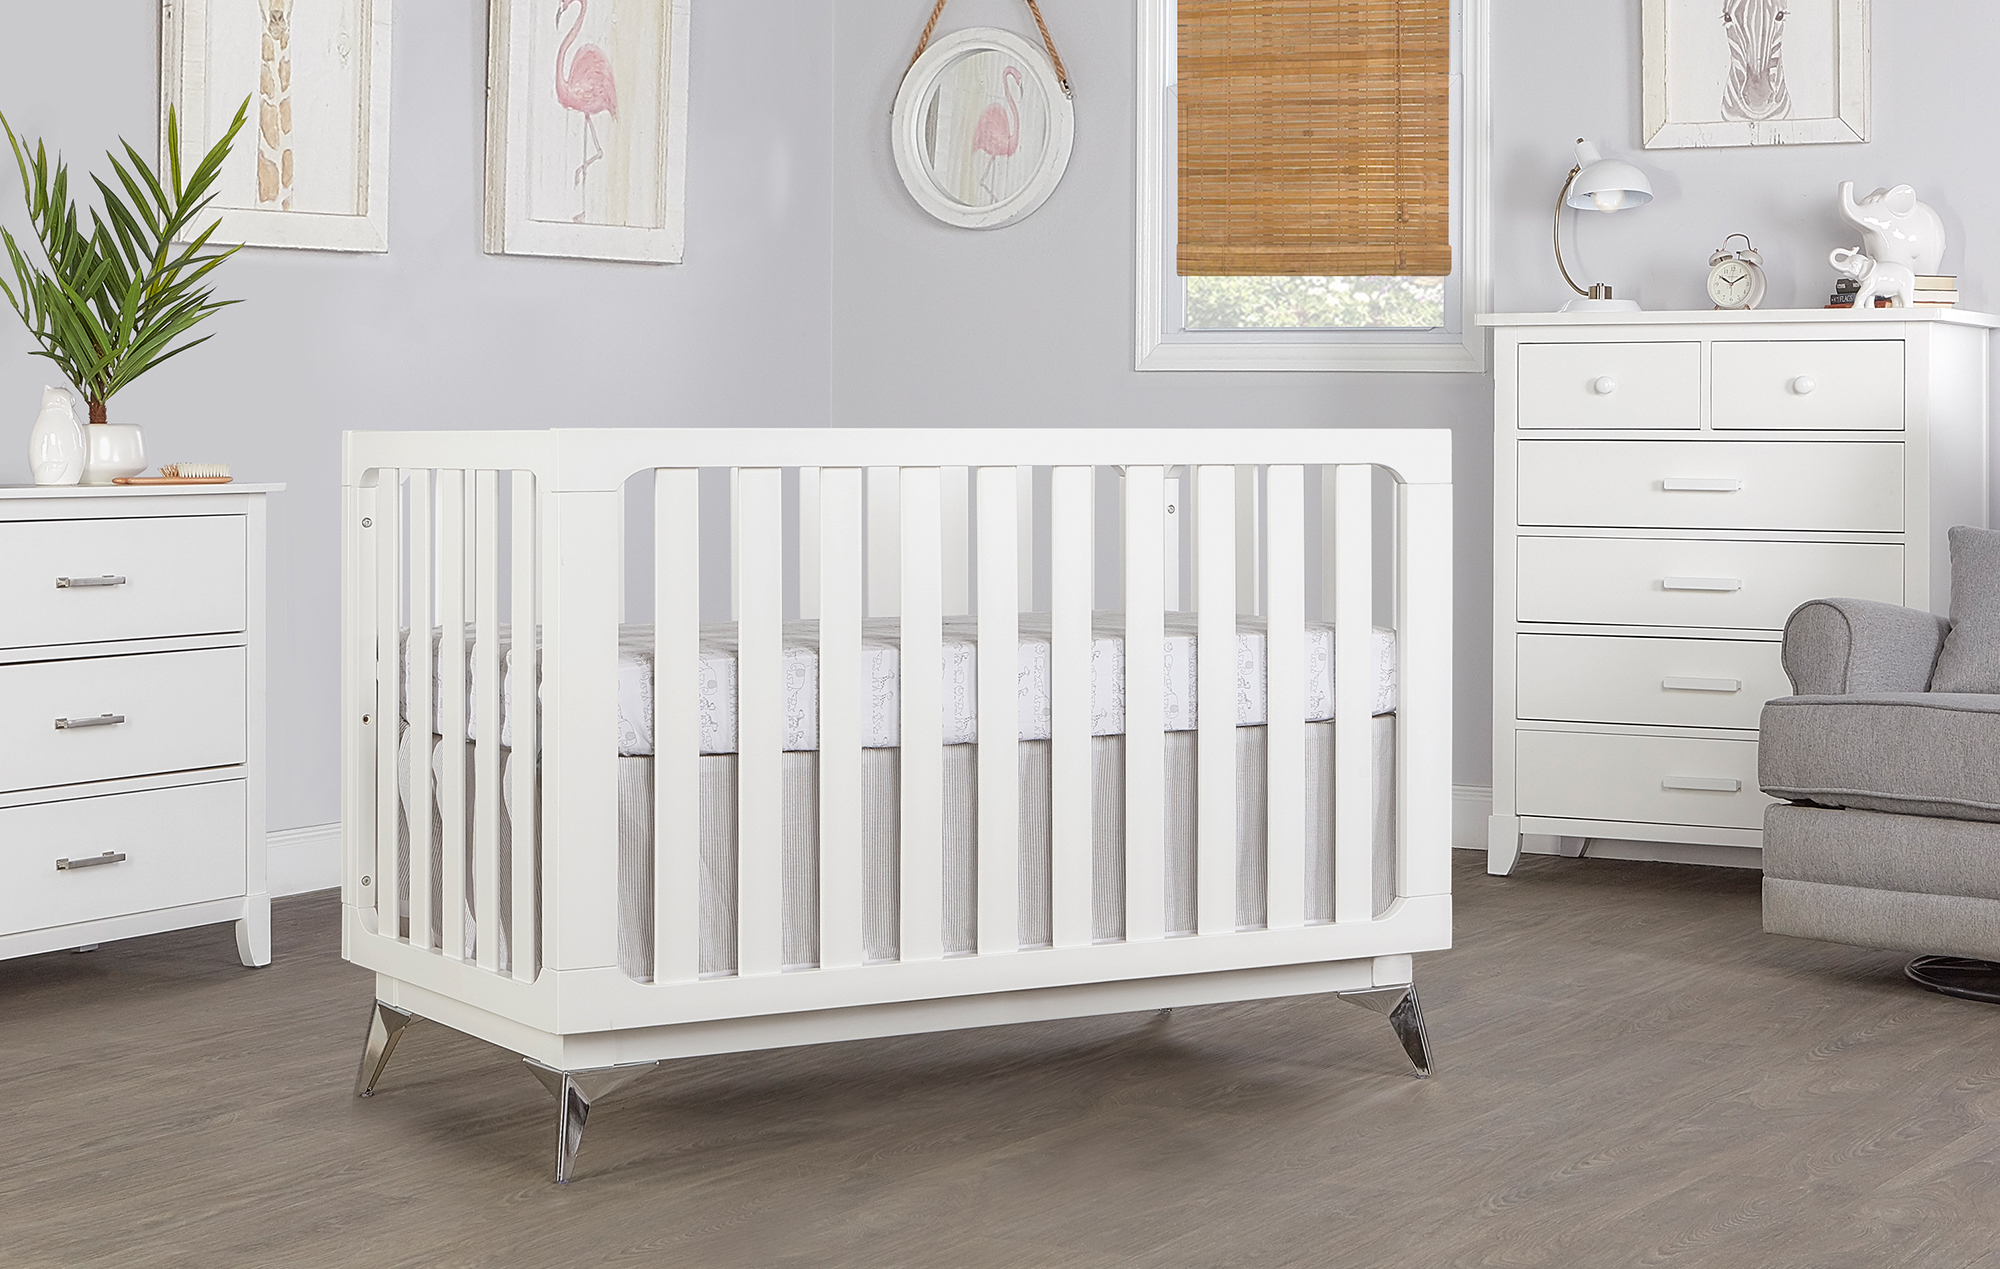 770_W Ultra Modern Crib Room Shot